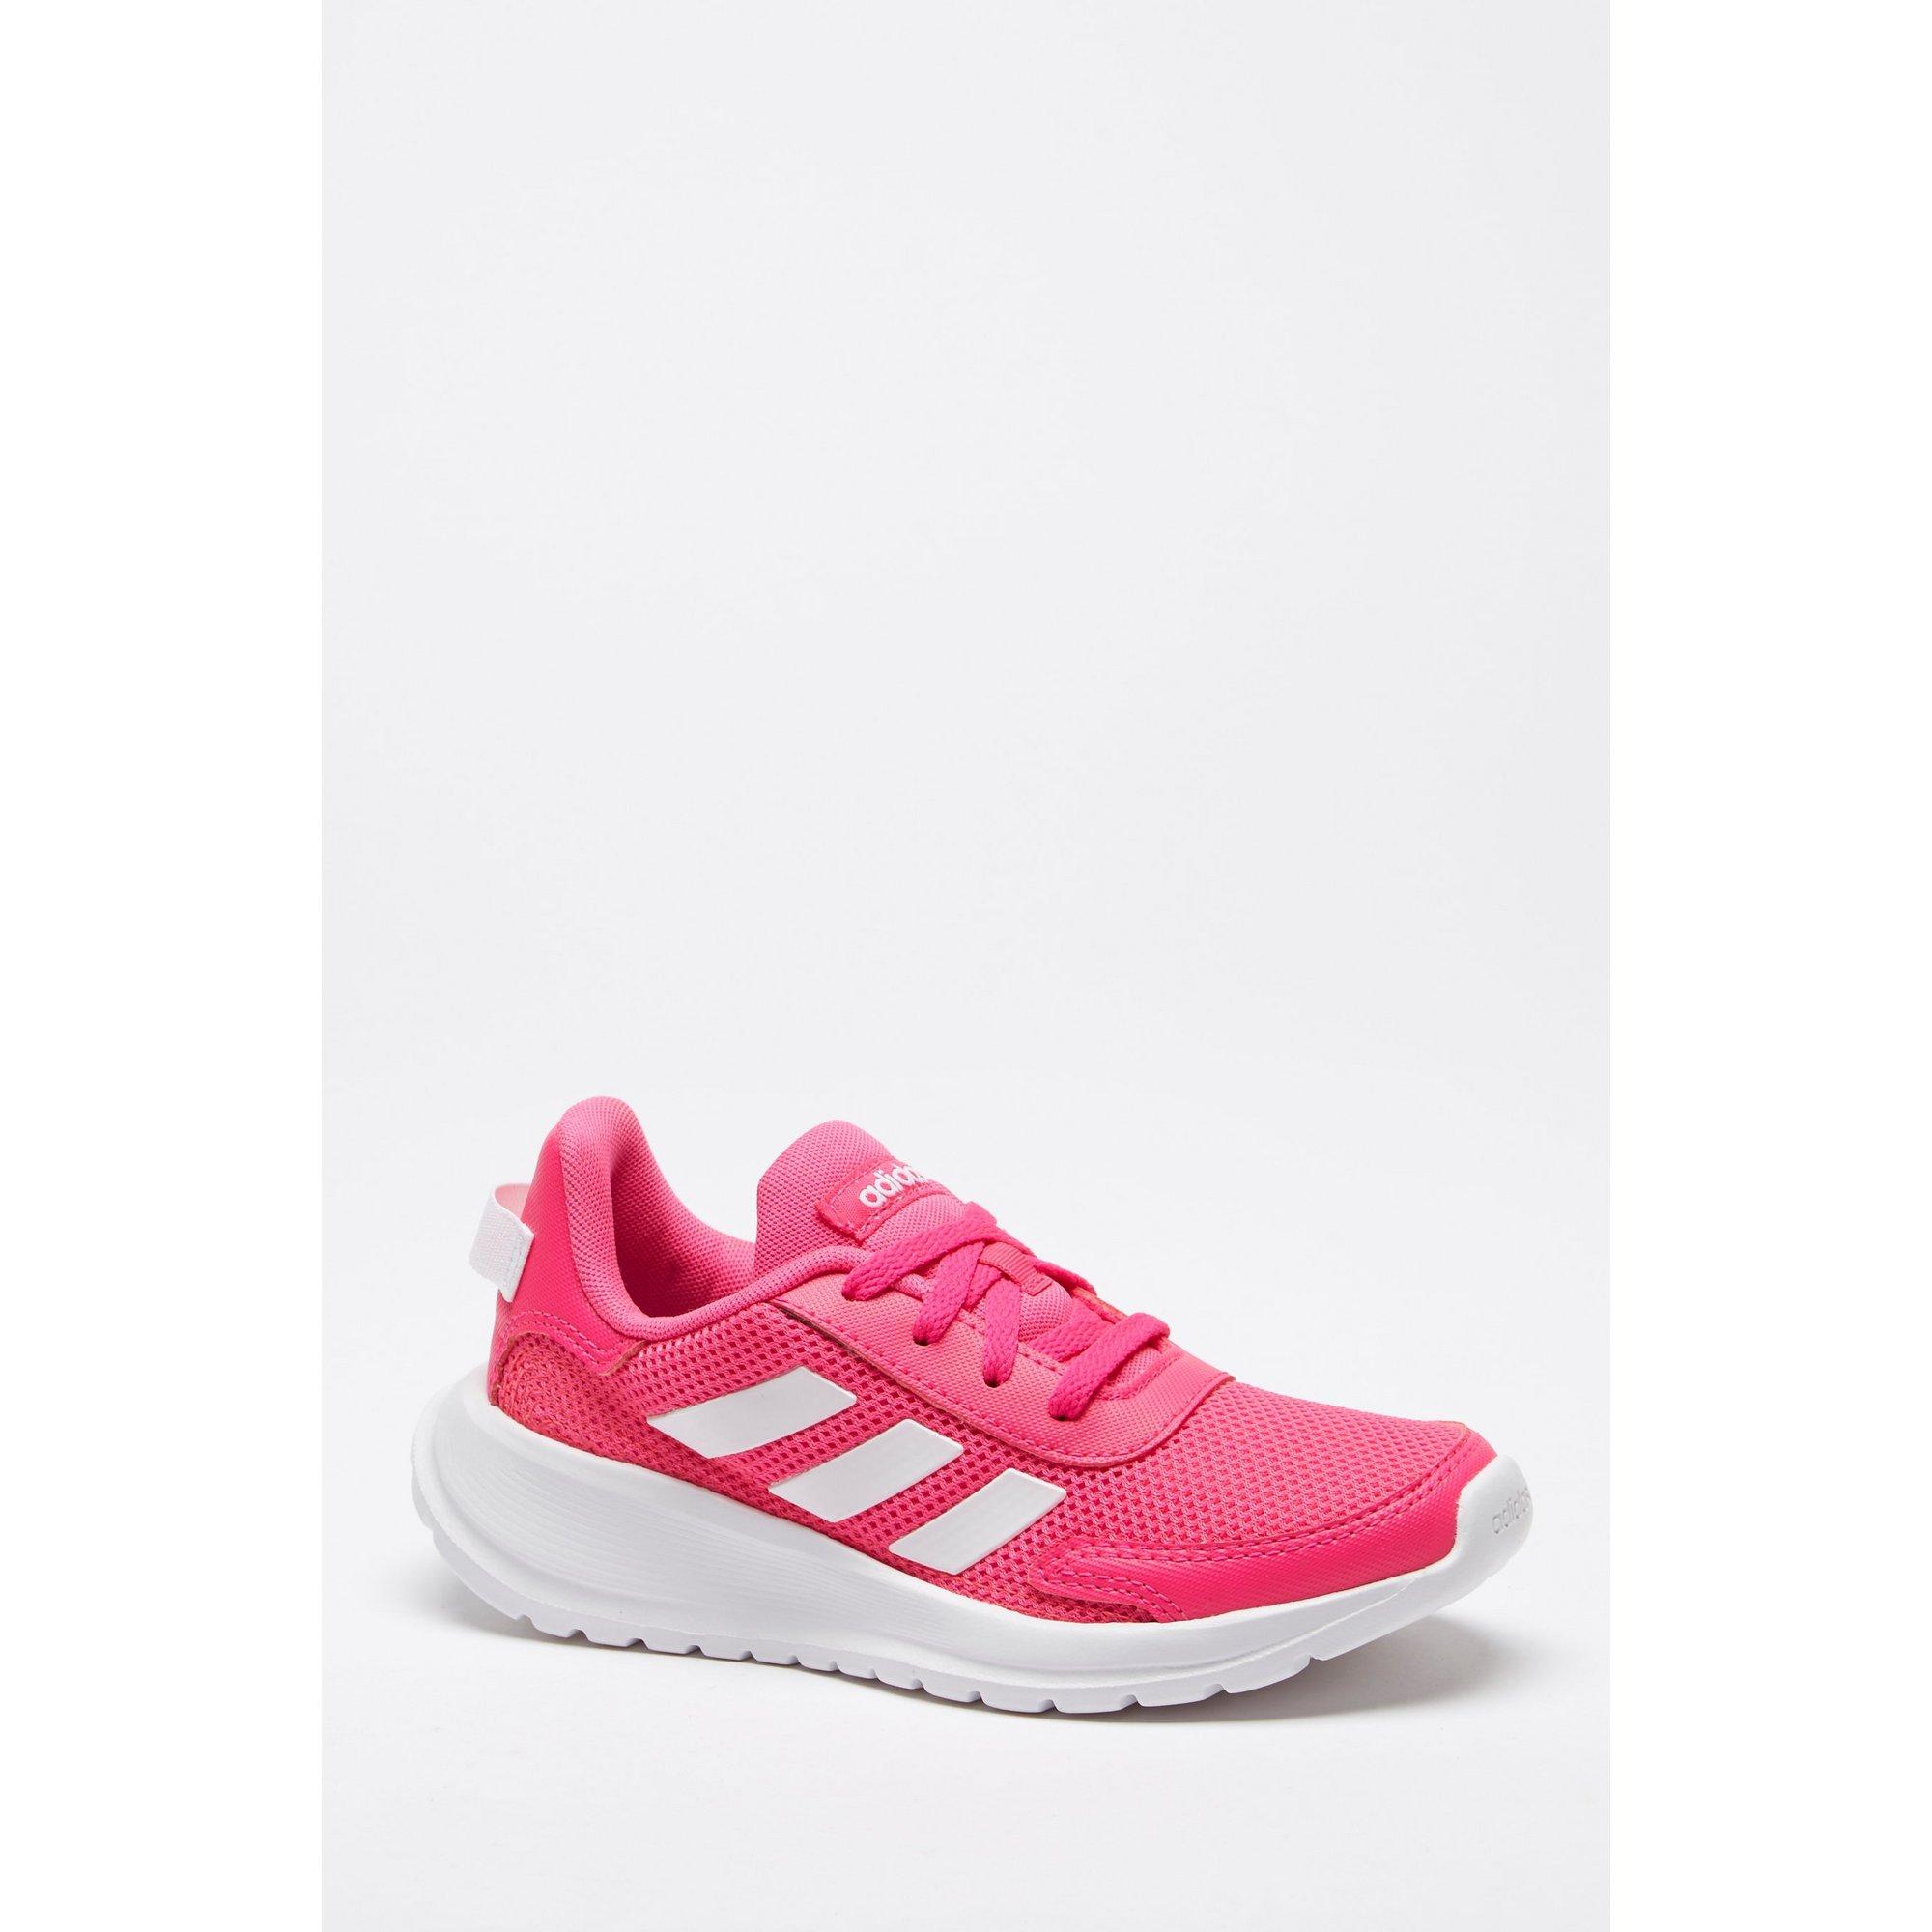 Image of adidas Tensaur Pink Junior Run Trainers